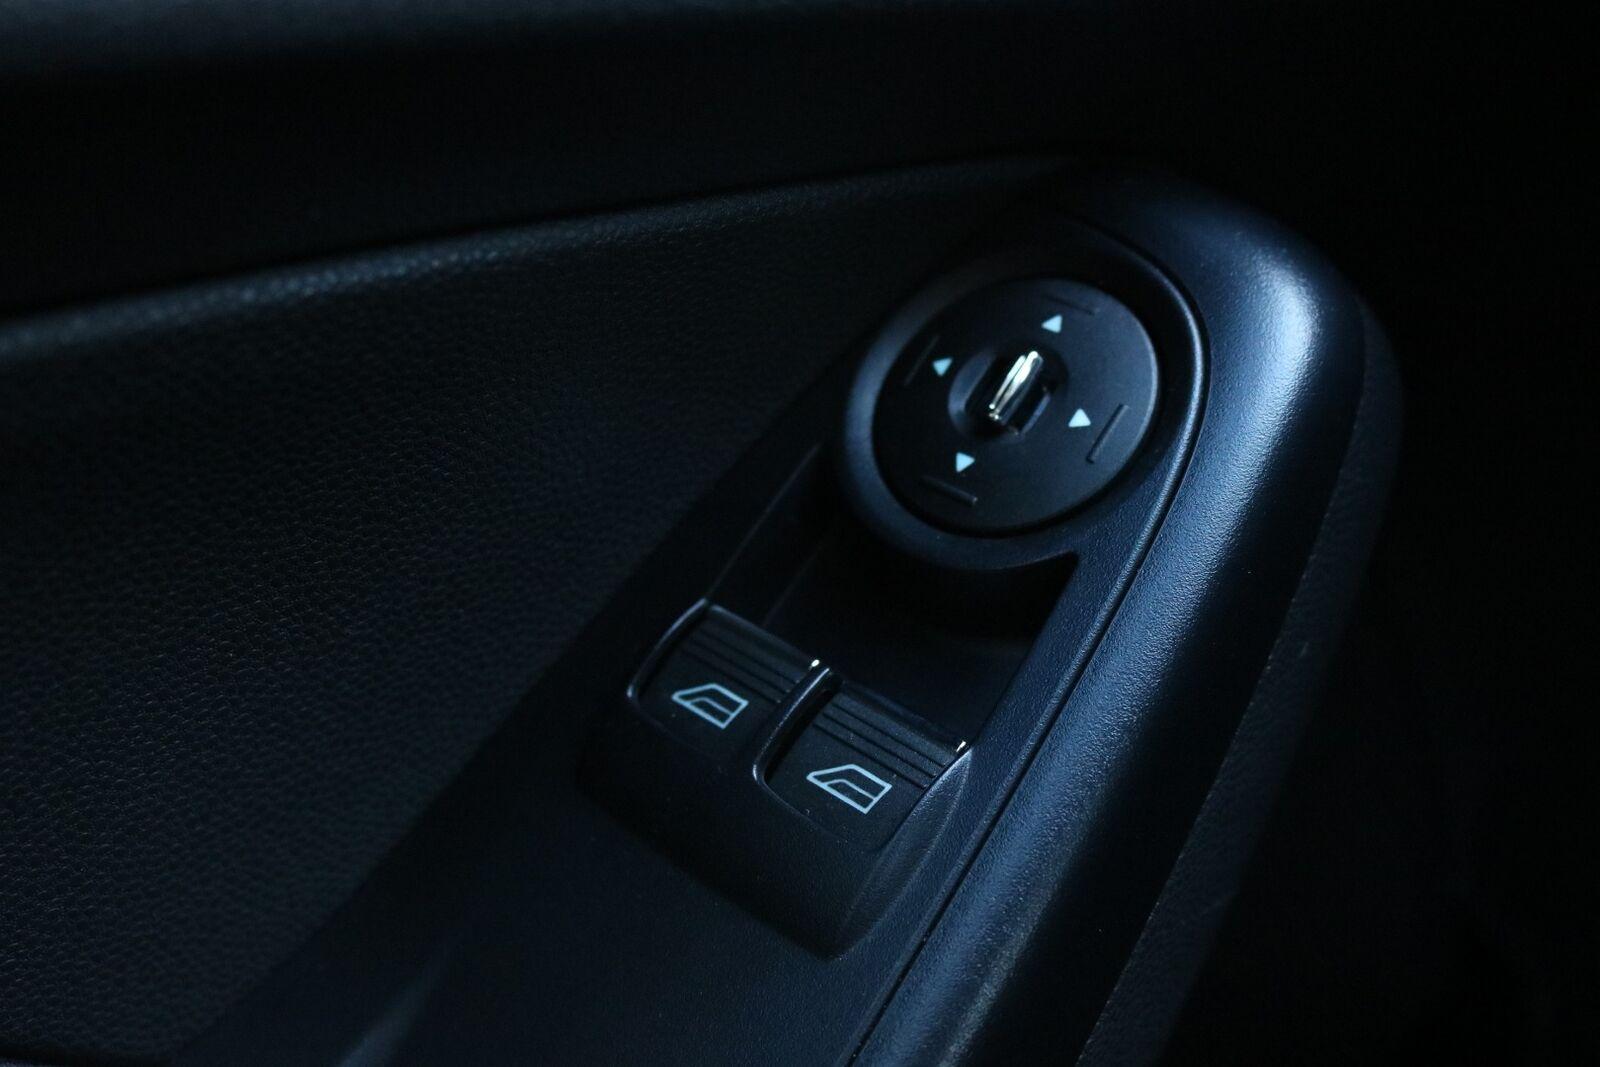 Ford Fiesta SCTi 100 Trend